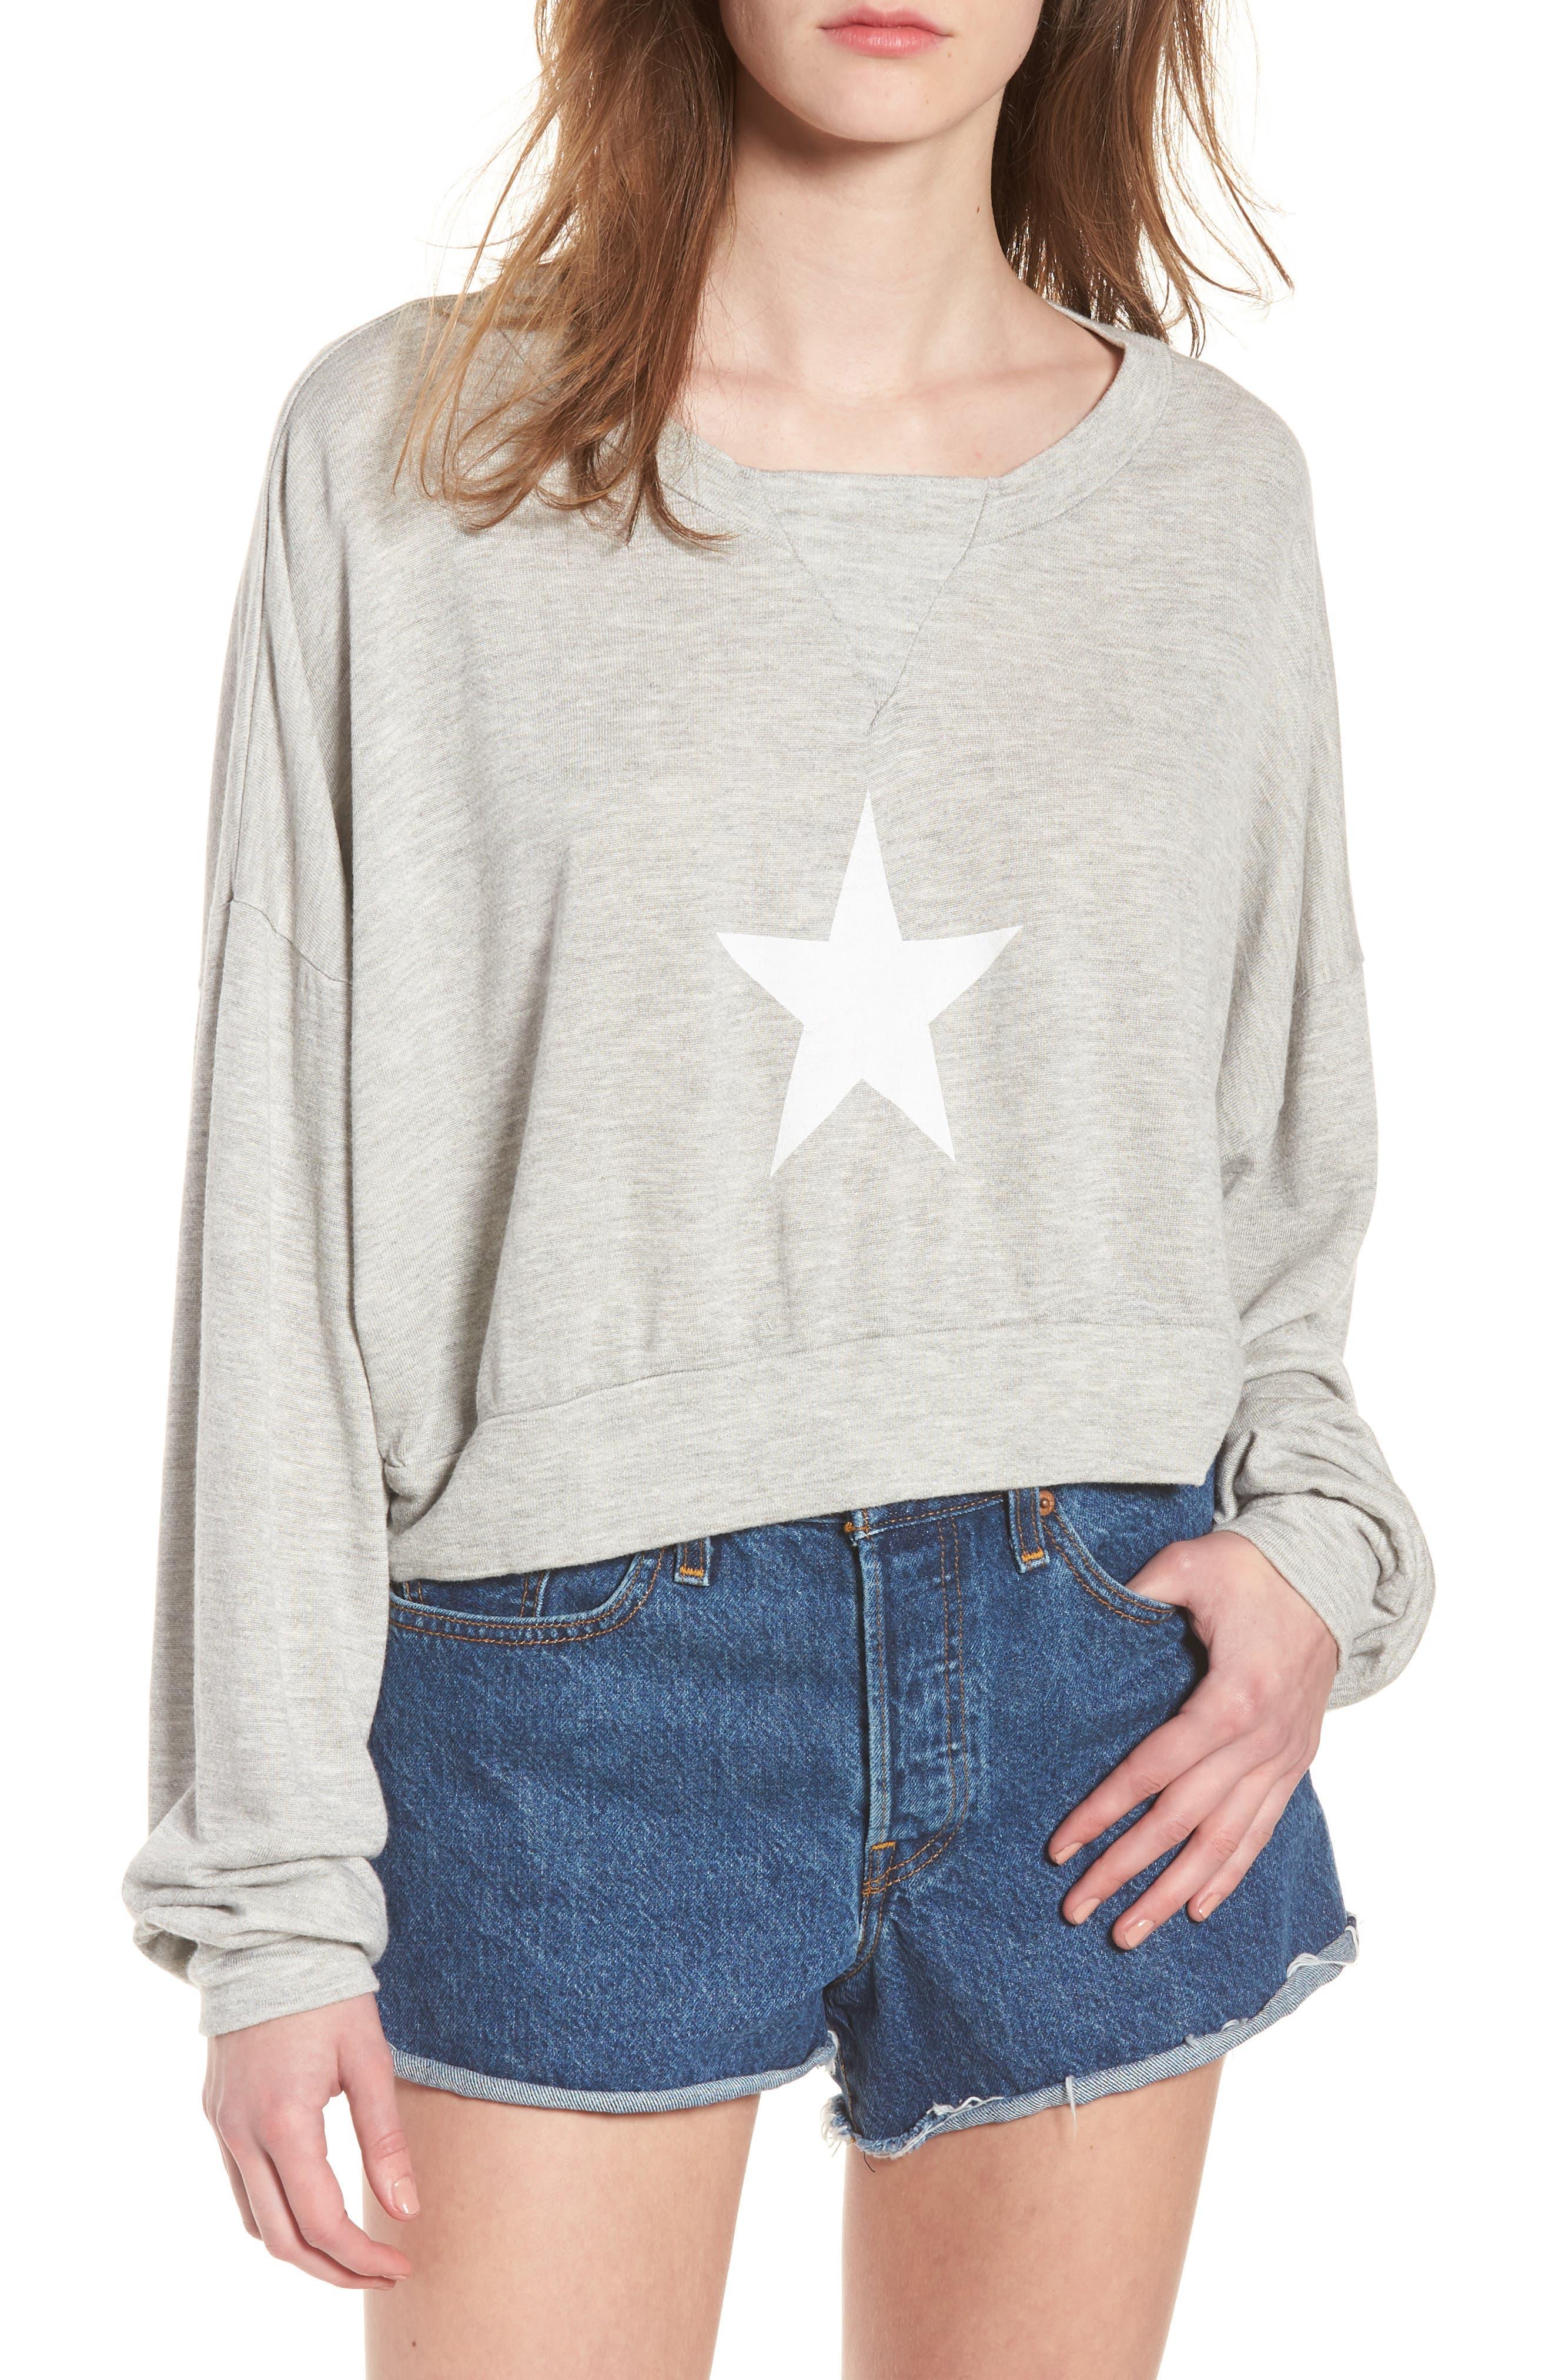 All Star Nella Pullover Sweatshirt,                             Main thumbnail 1, color,                             020